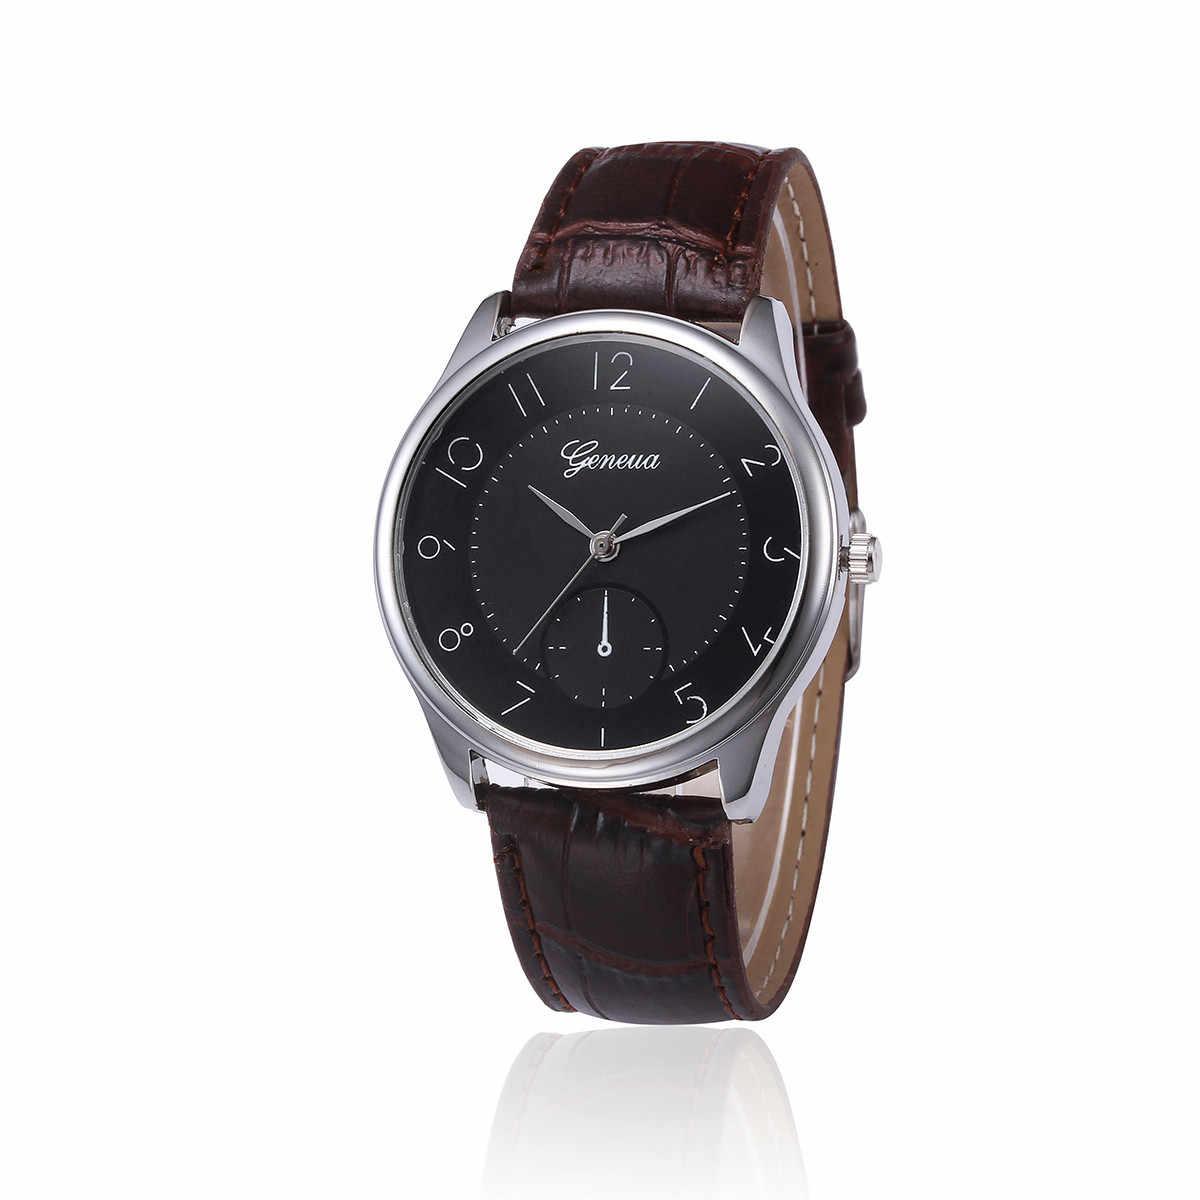 Reloj Retro para hombre reloj de pulsera de cuarzo reloj de pulsera reloj para hombre relojes para hombre erkek saat horlogues mannel oromo horloge